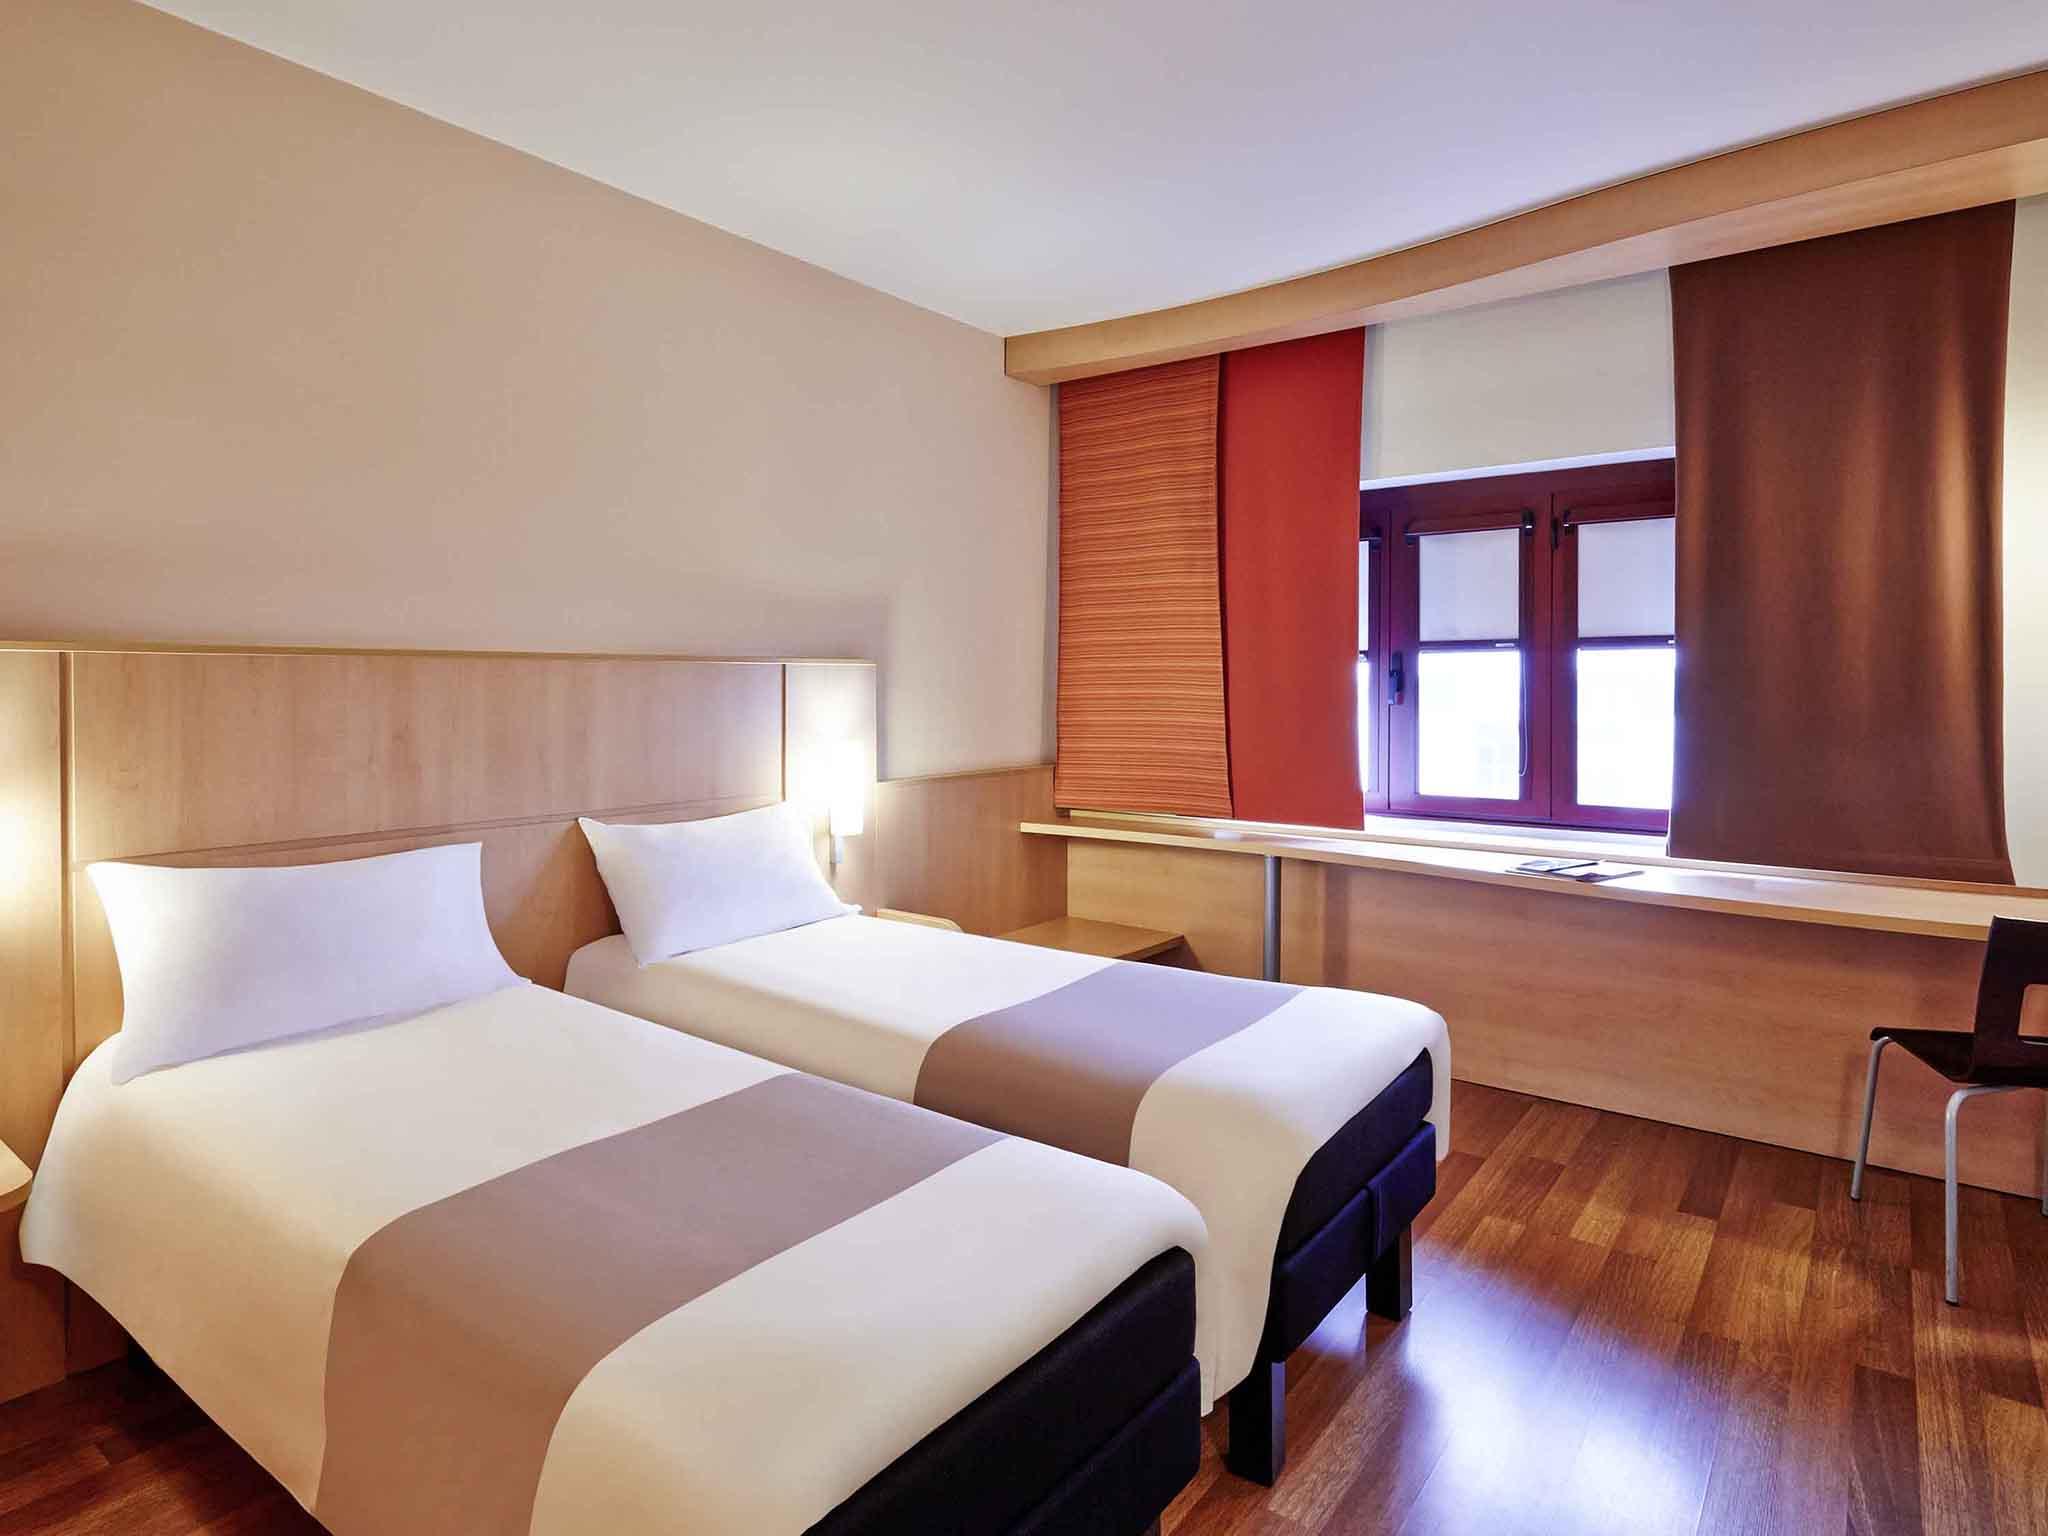 ibis Padua hotel